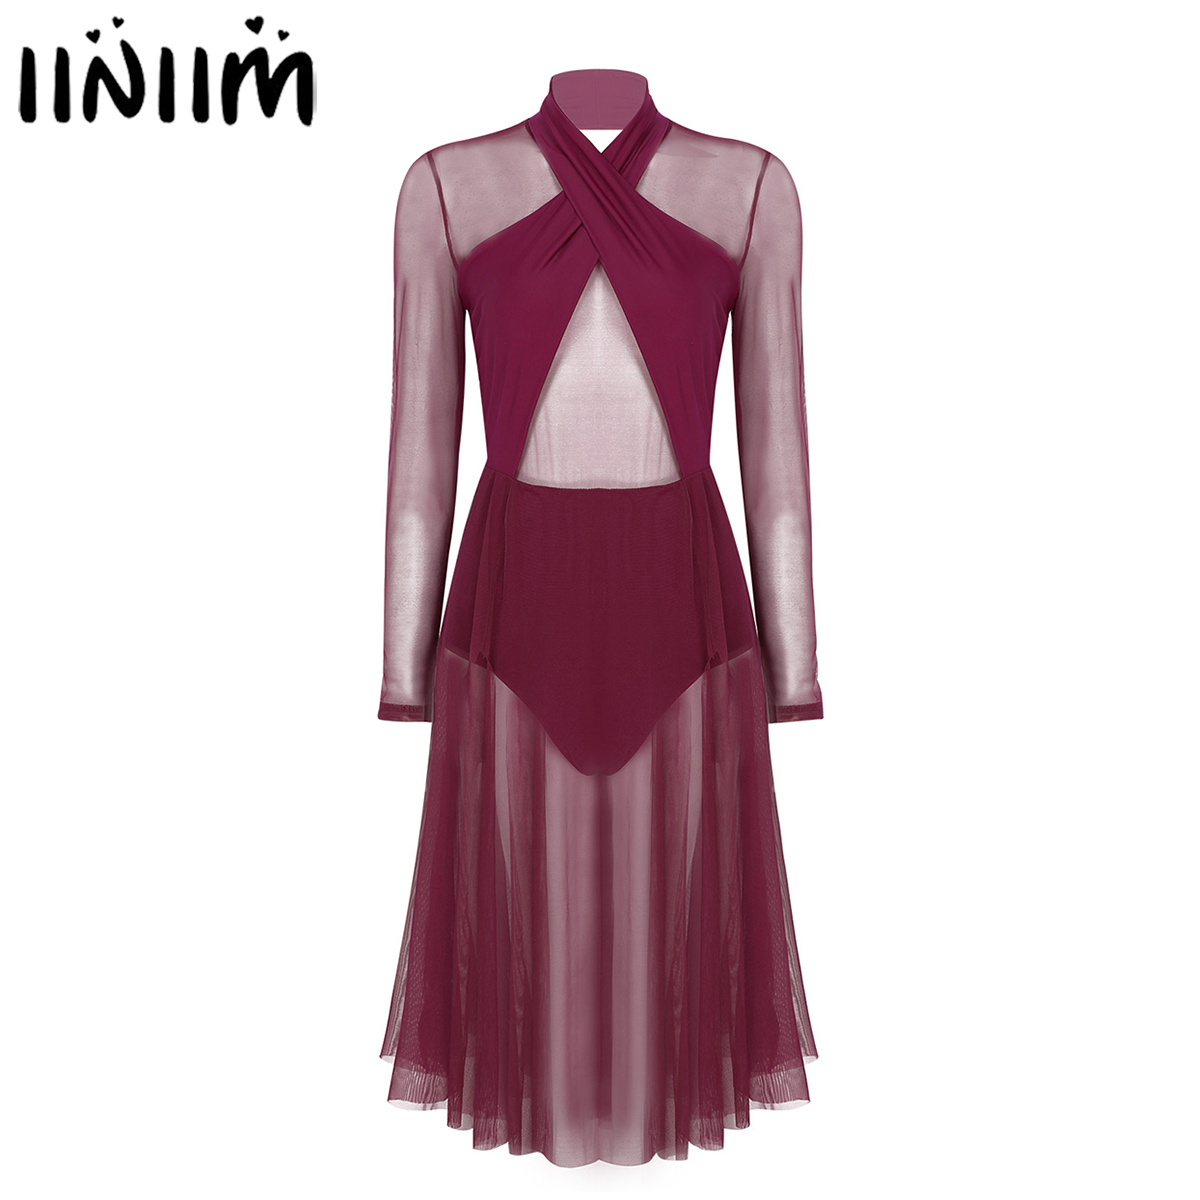 Women Adults Ballerina Costumes See Through Sheer Mesh Top Bodice Leotard Dress For Gym Lyrical Modern Contemporary Dancewear